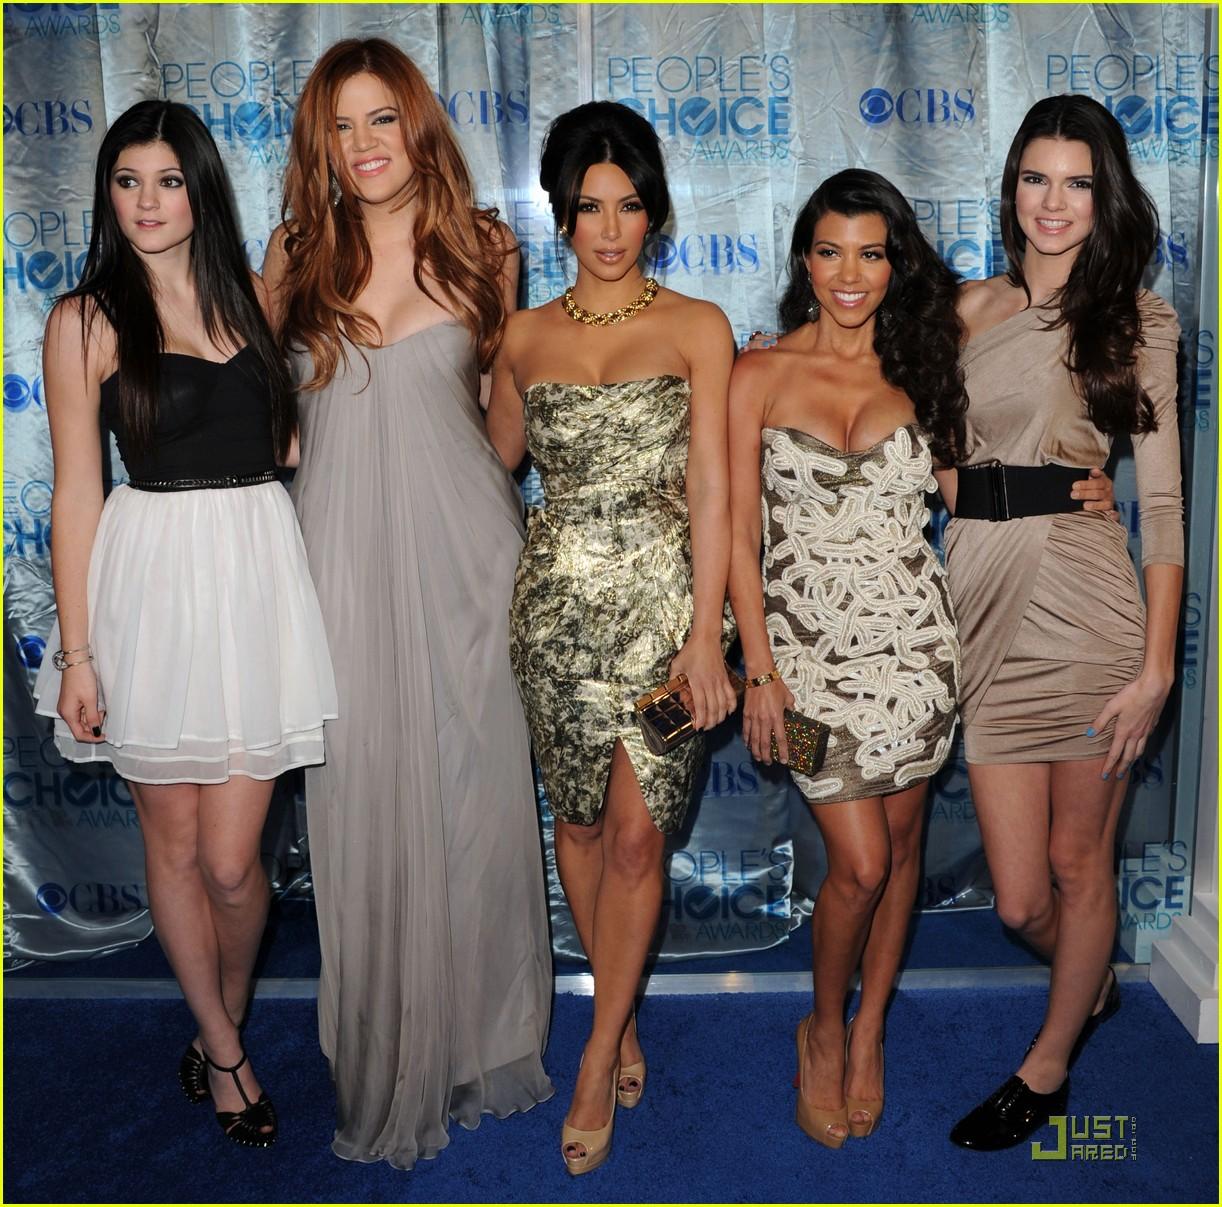 http://2.bp.blogspot.com/_yNjTLrE2bPs/TSYUi7bcrmI/AAAAAAAAAWA/sllzM4Eft-g/s1600/kim-kardashian-pca-07.jpg